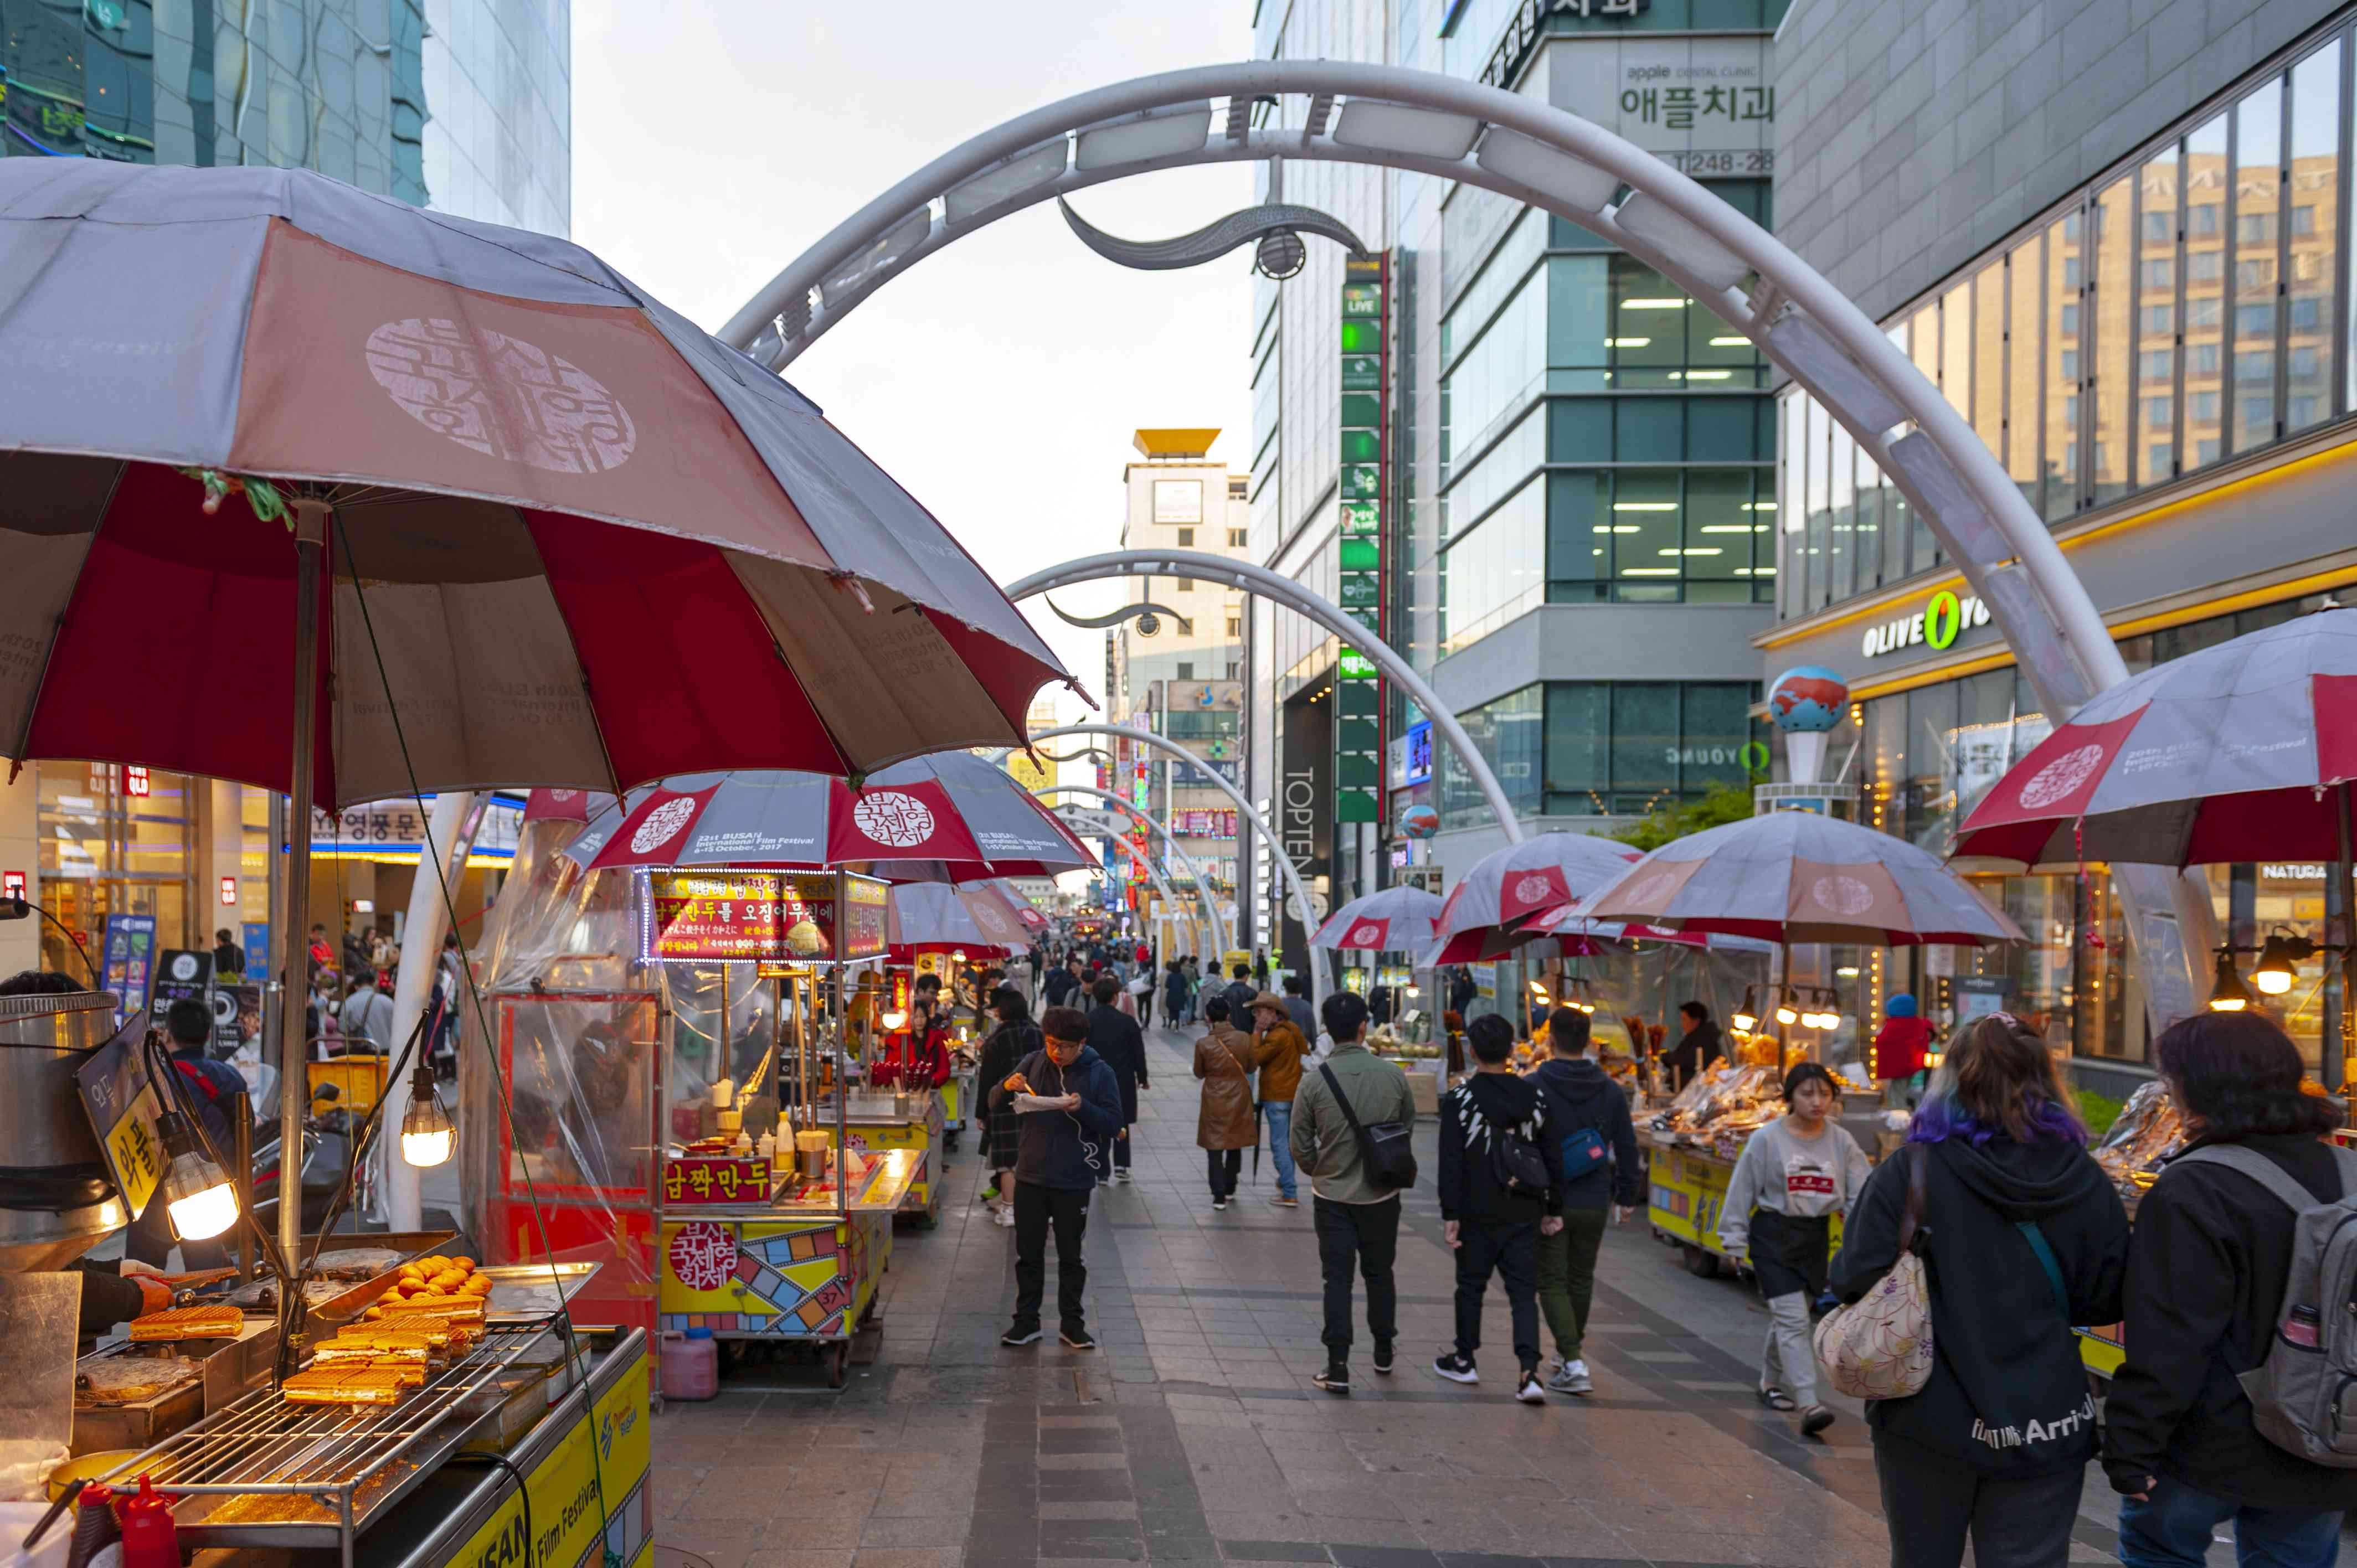 treet food stalls and shops along the way in Nampodong, Busan City, South Korea